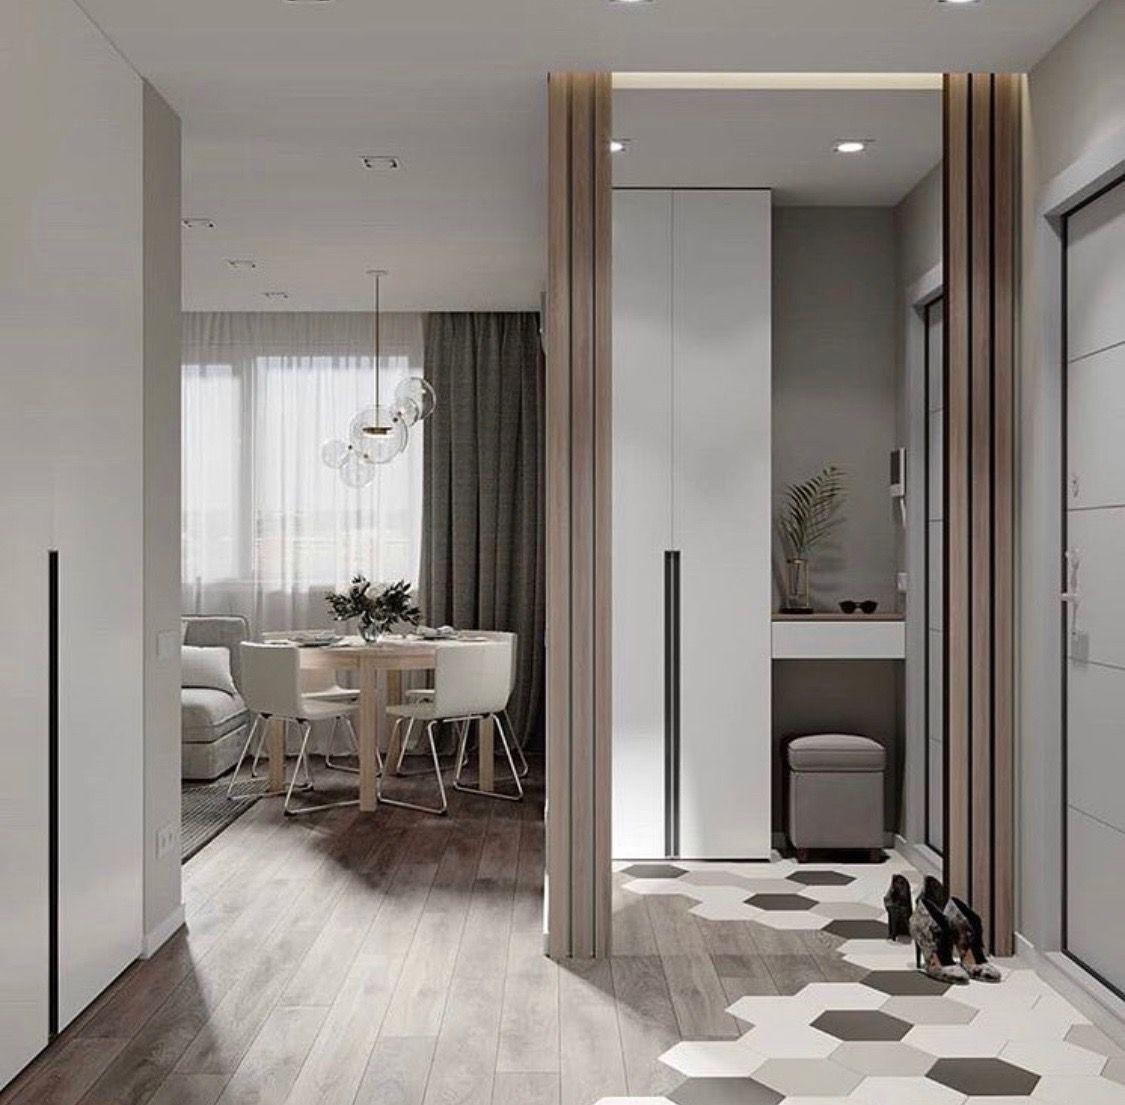 Pin By Anna Kireeva On Interior House Interior Decor Home Room